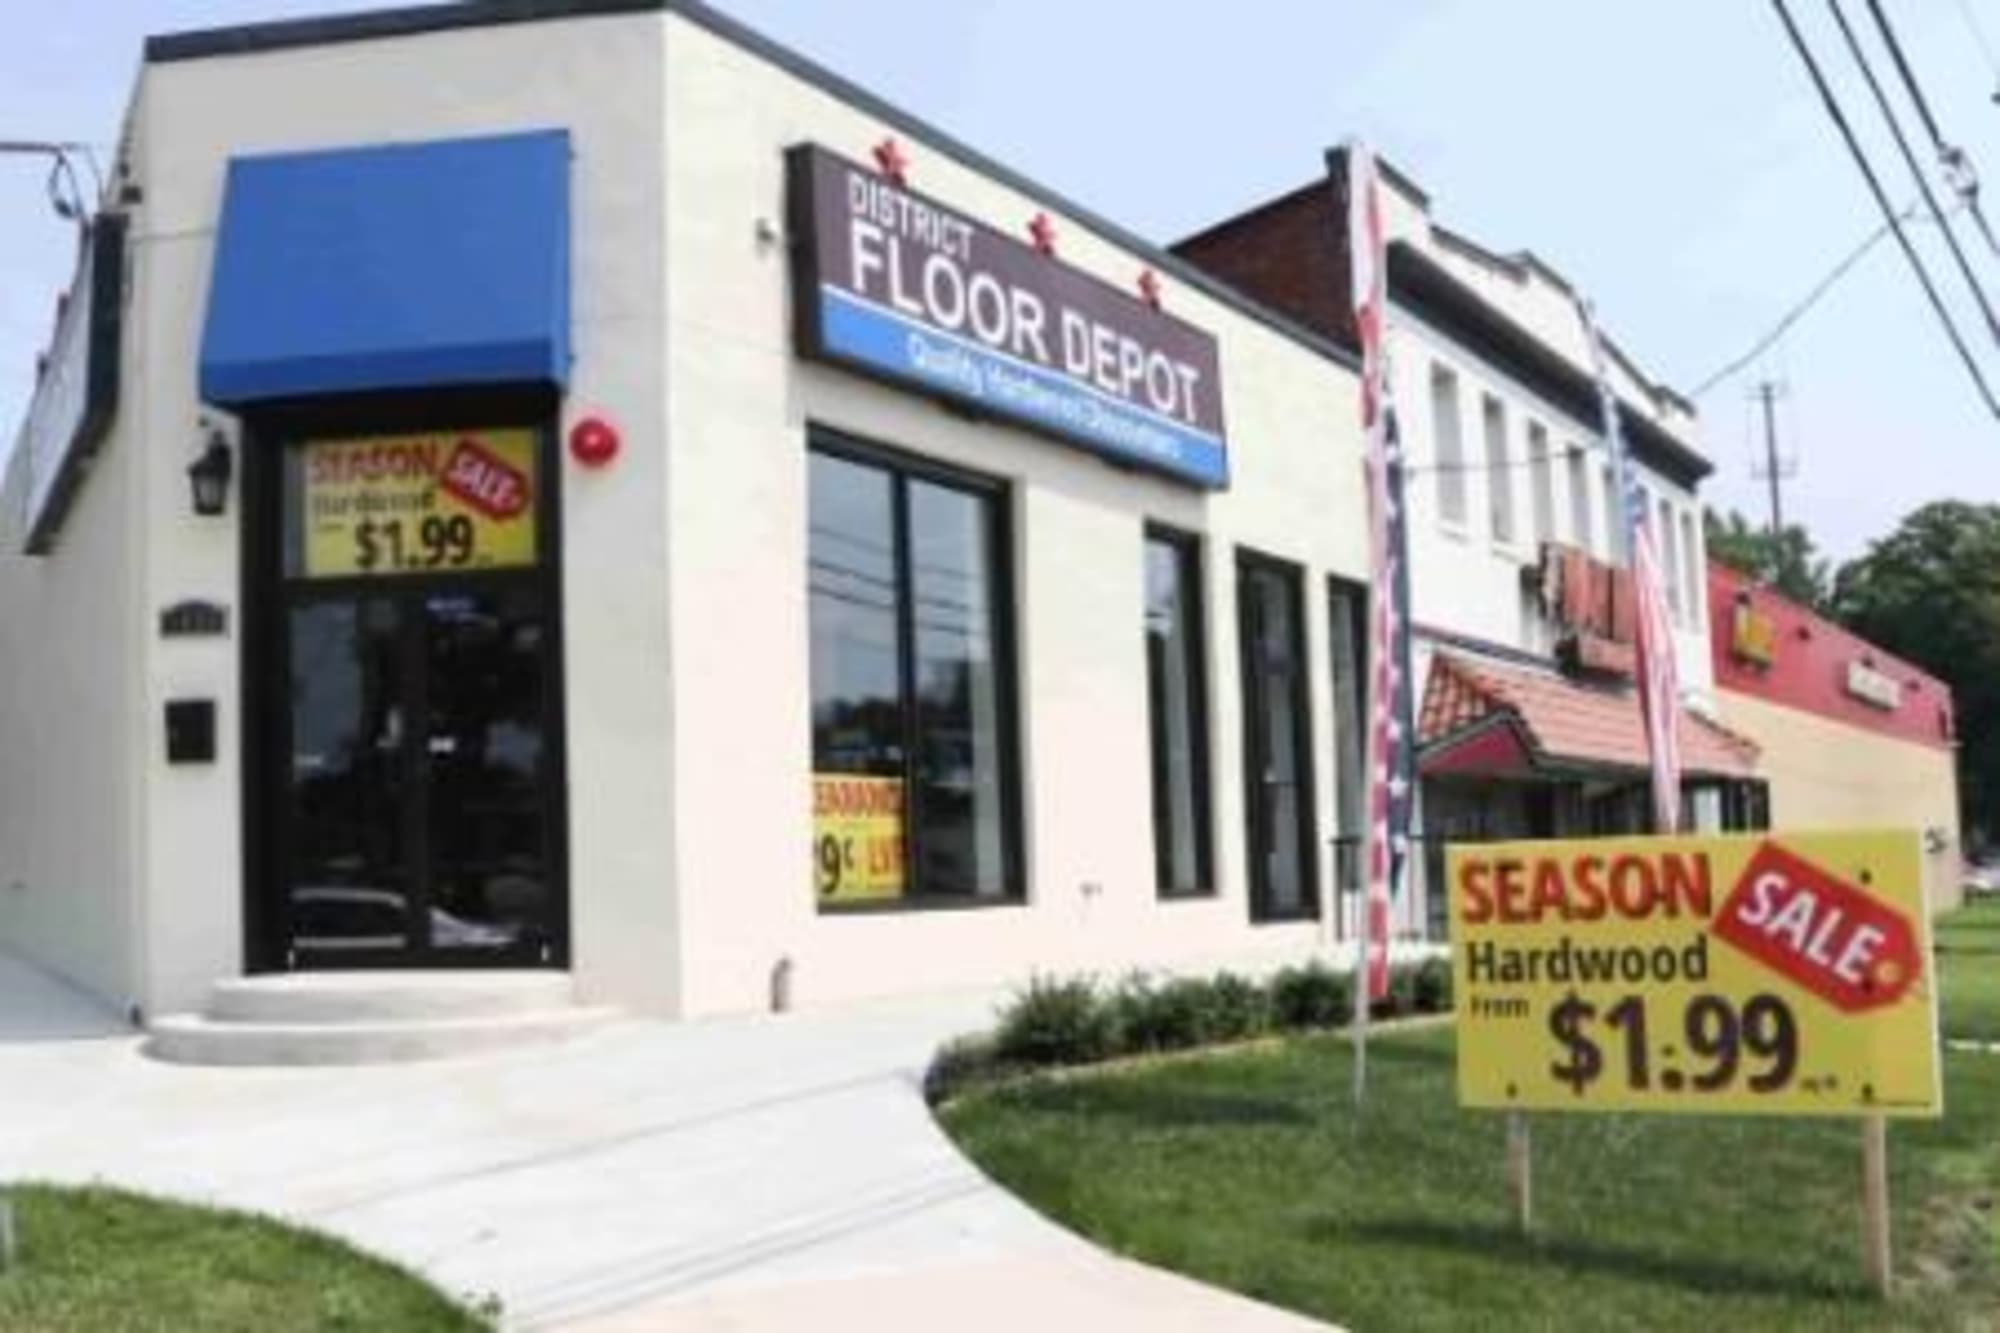 District Floor Depot - 1600 Rhode Island Ave NE Washington, DC 20018